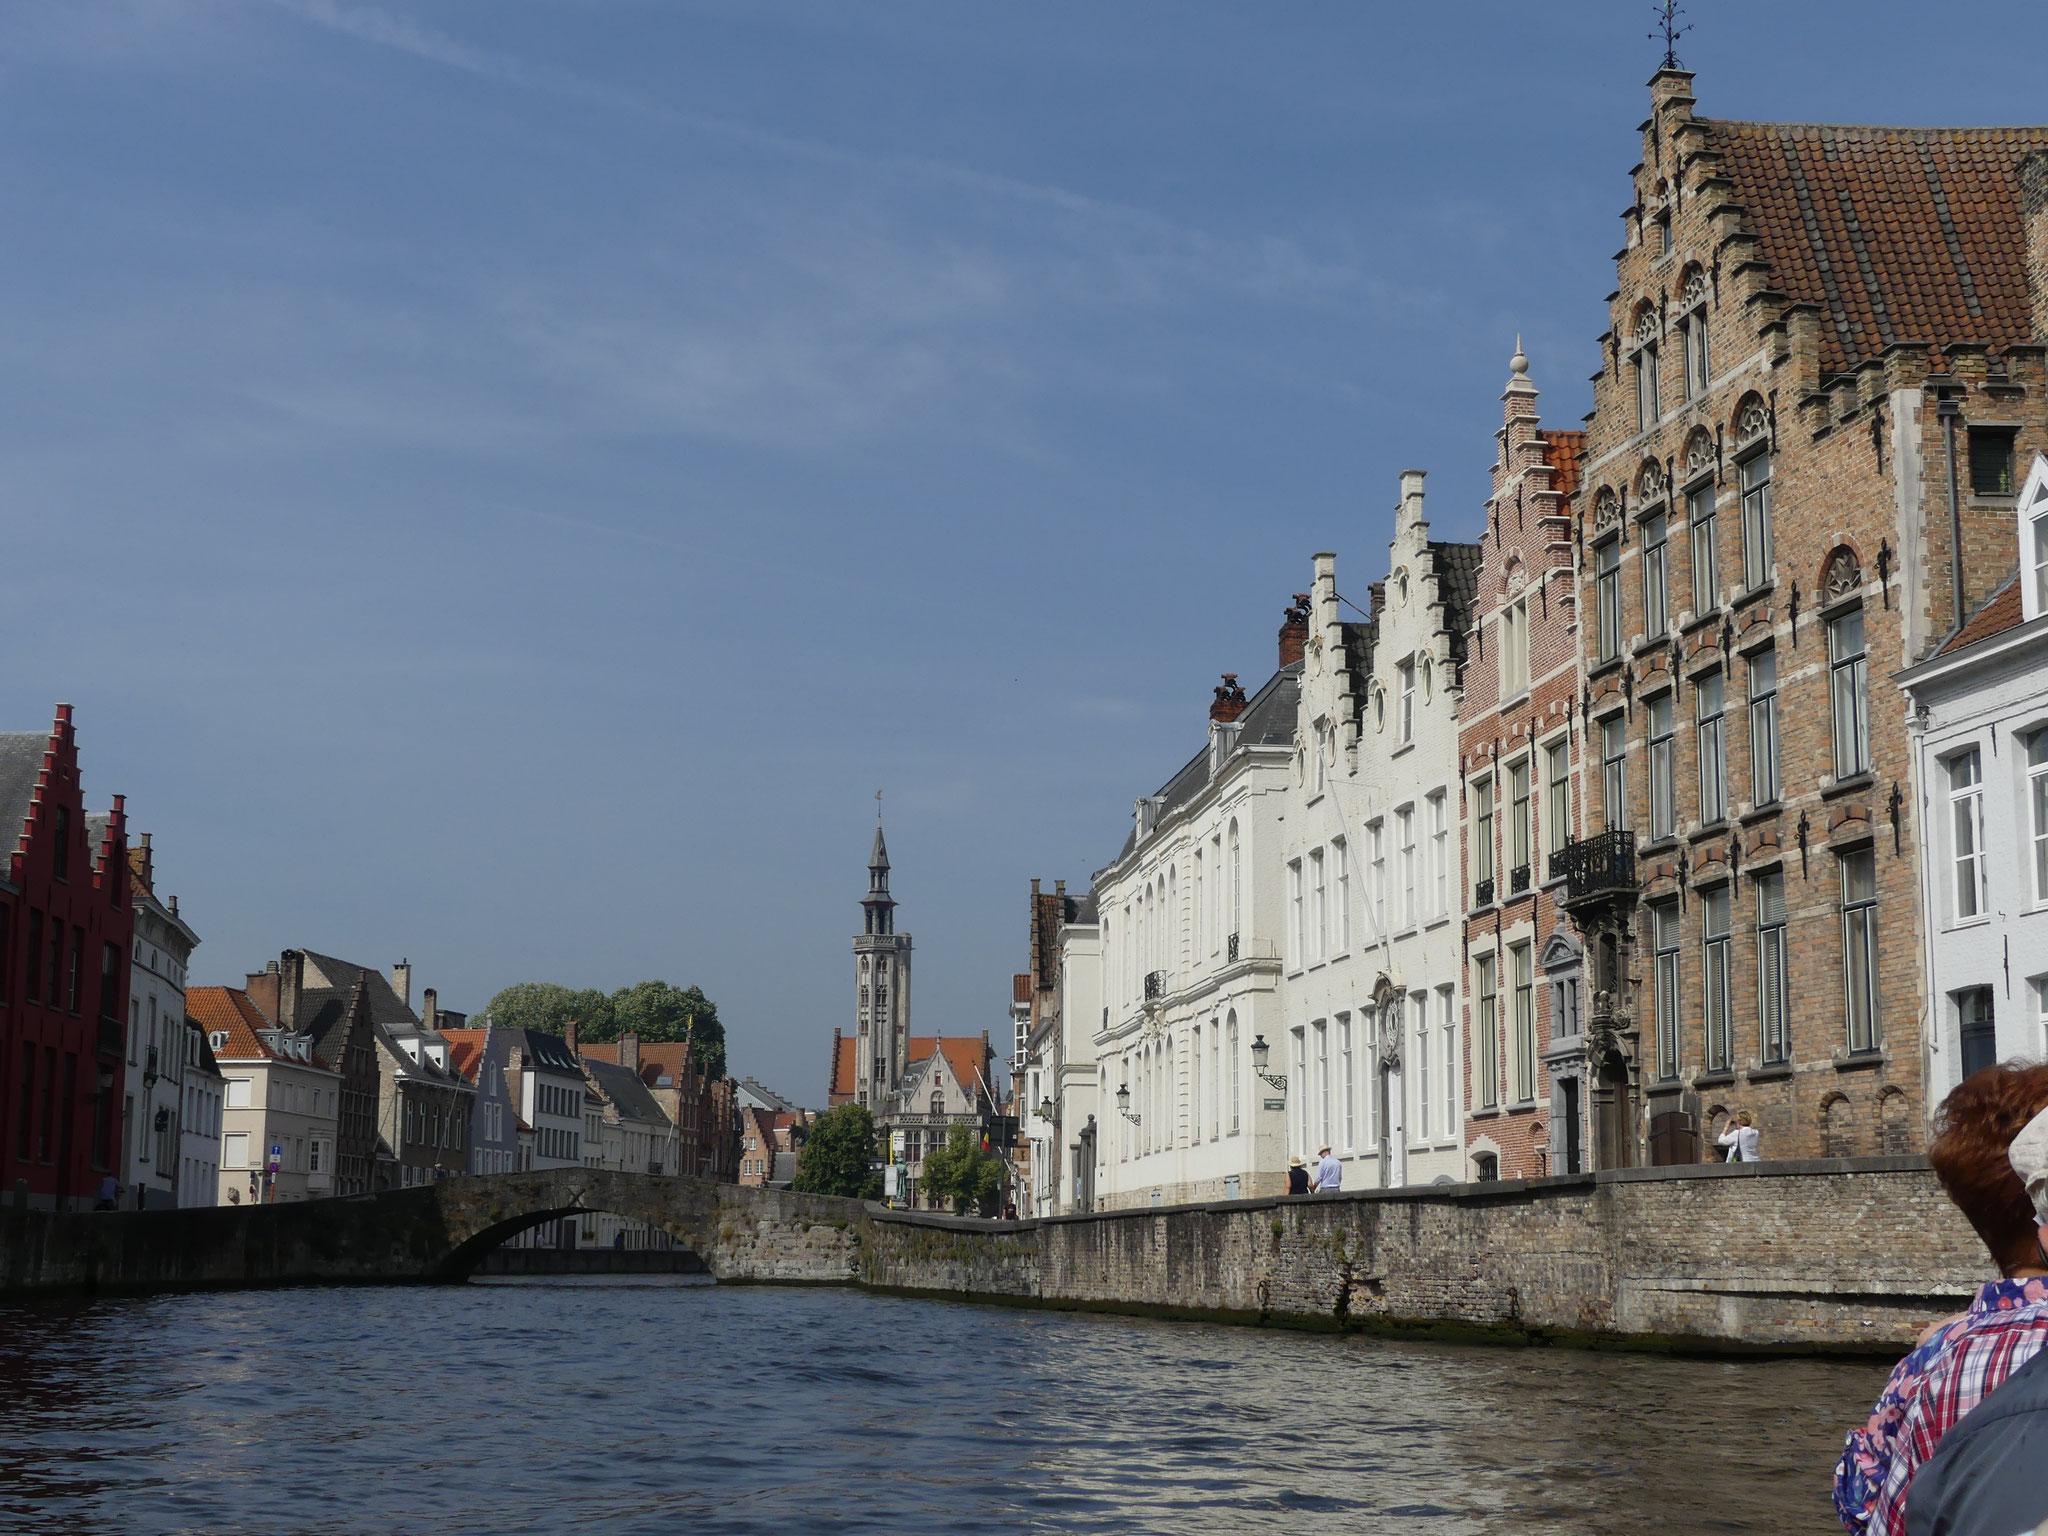 Vue de notre restaurant : Canal de Gand